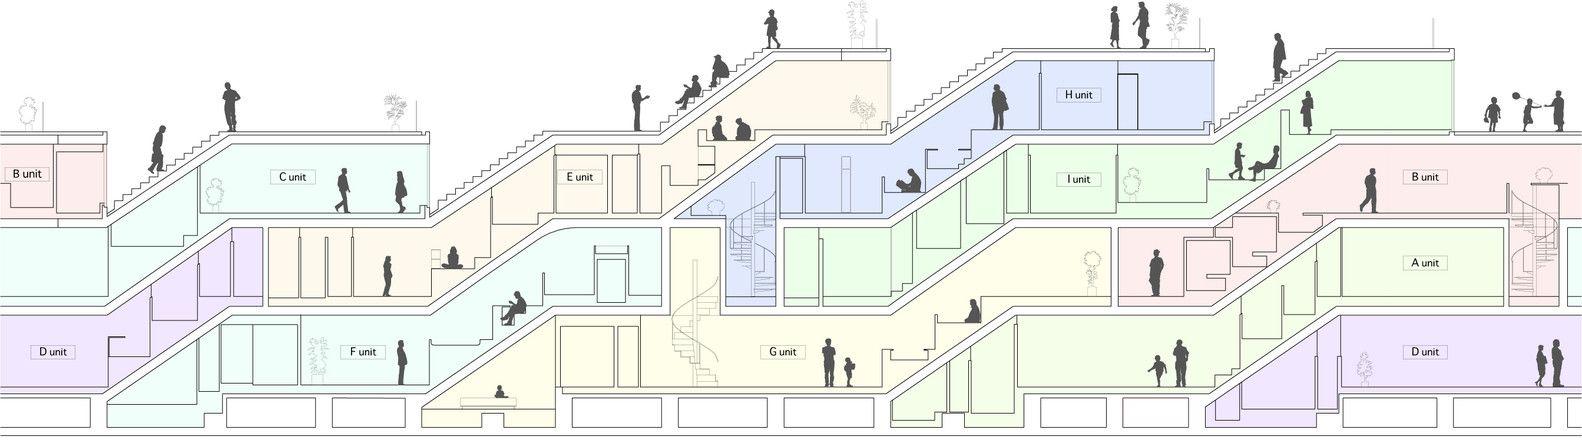 Galería - Slide / Komada Architects' Office - 20